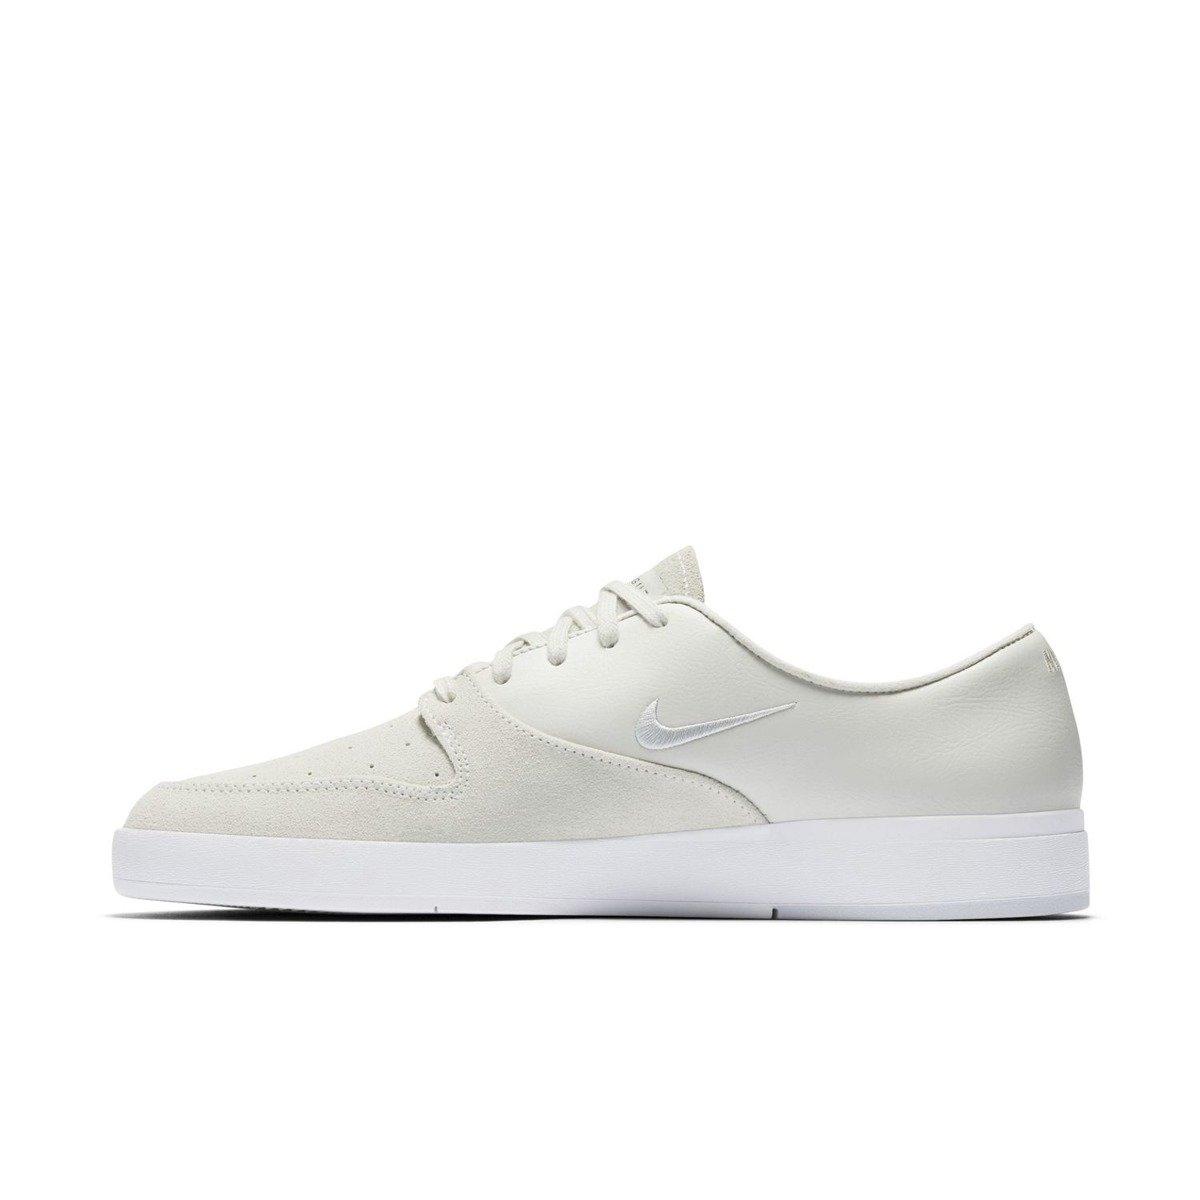 ... shoes nike sb zoom p-rod x white/pure platinum-black ...